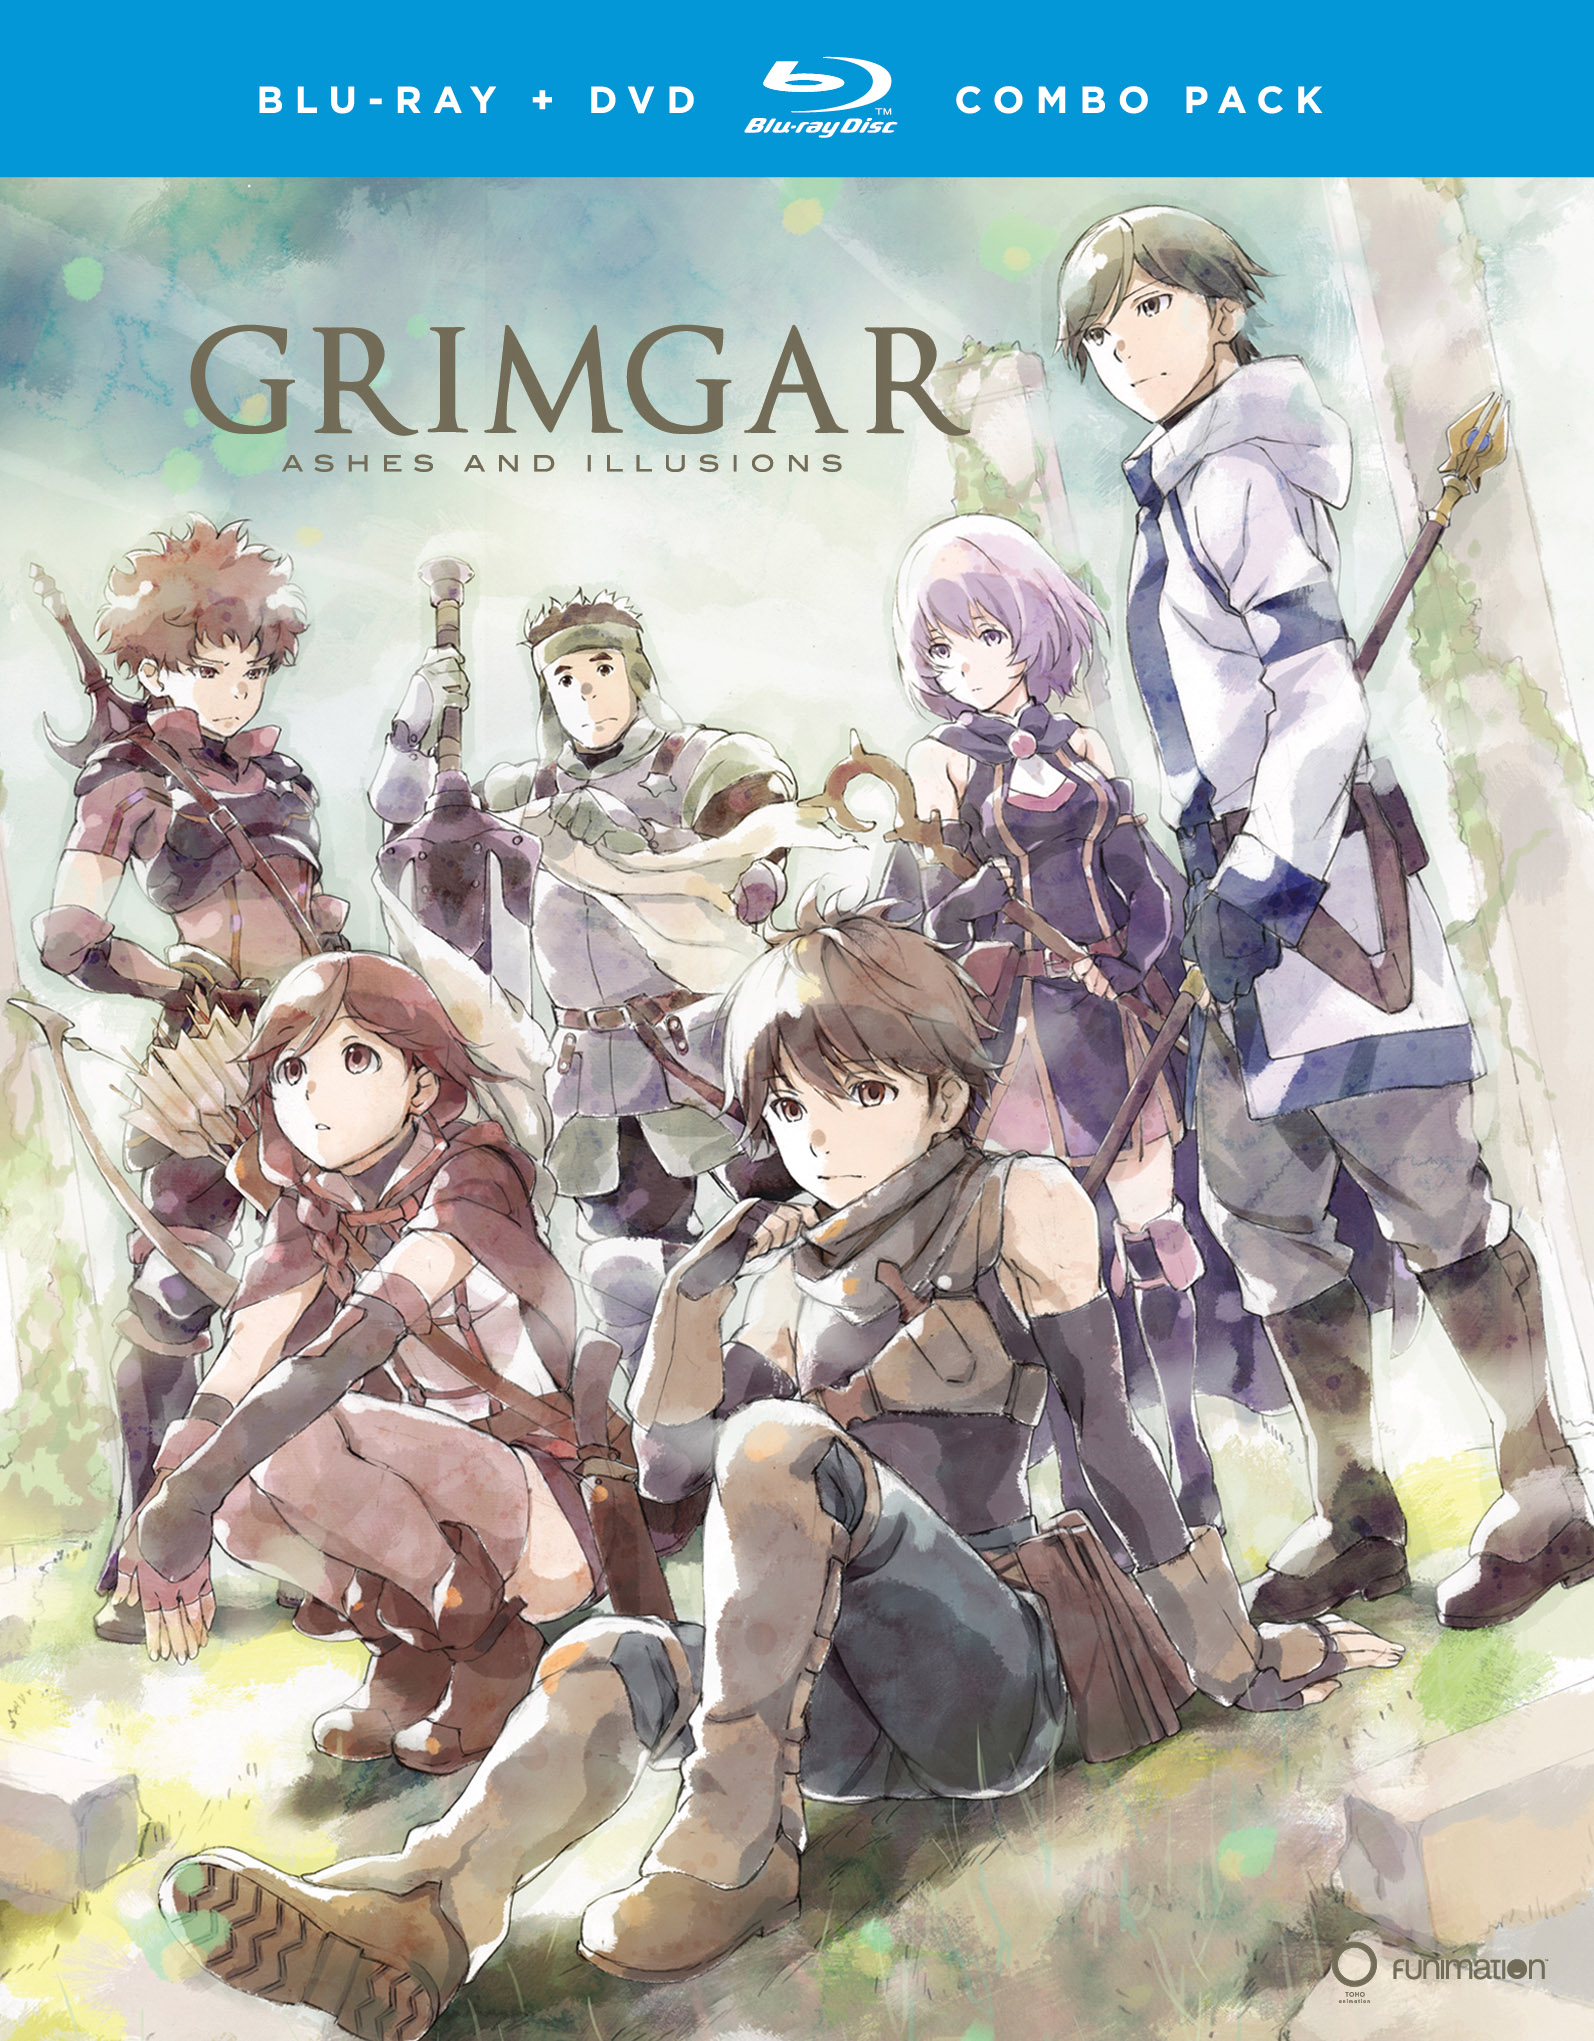 Grimgar Blu-ray/DVD 704400093265